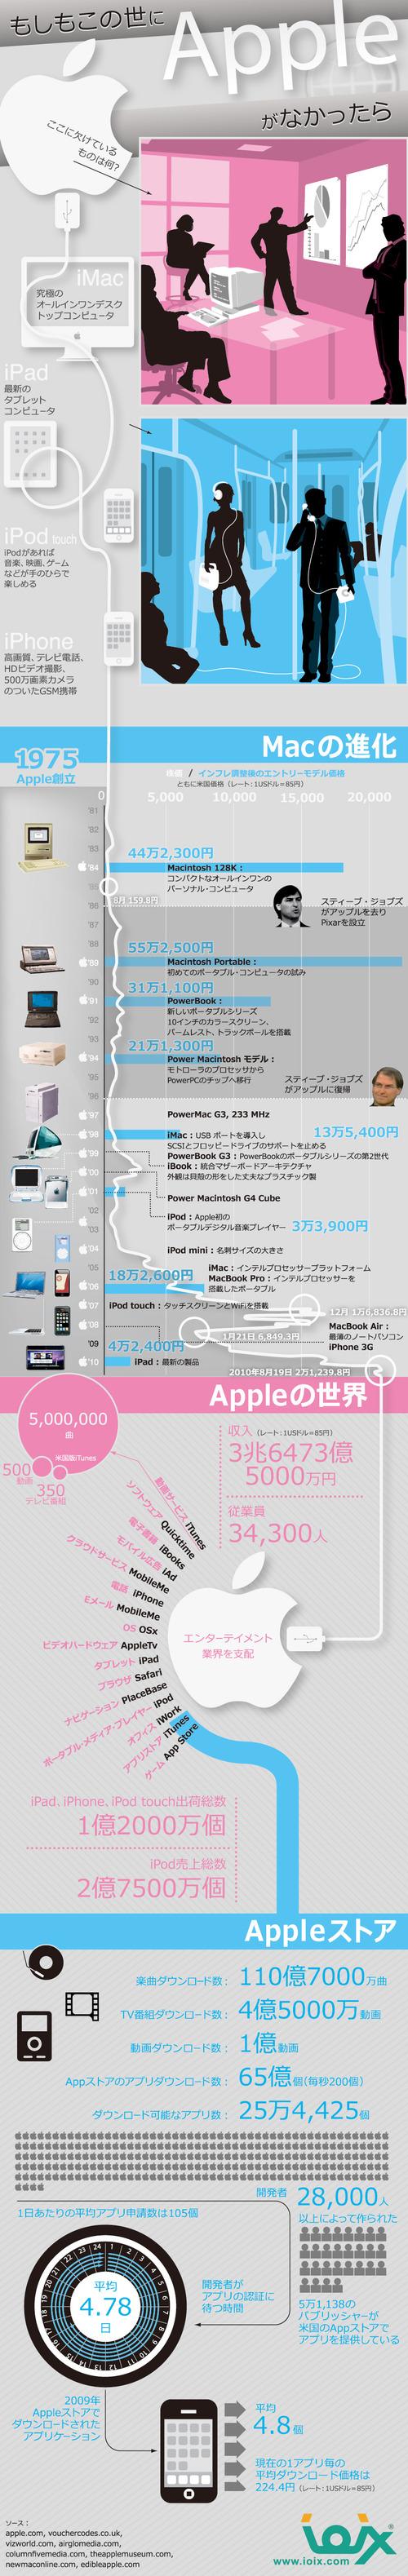 apple_855px